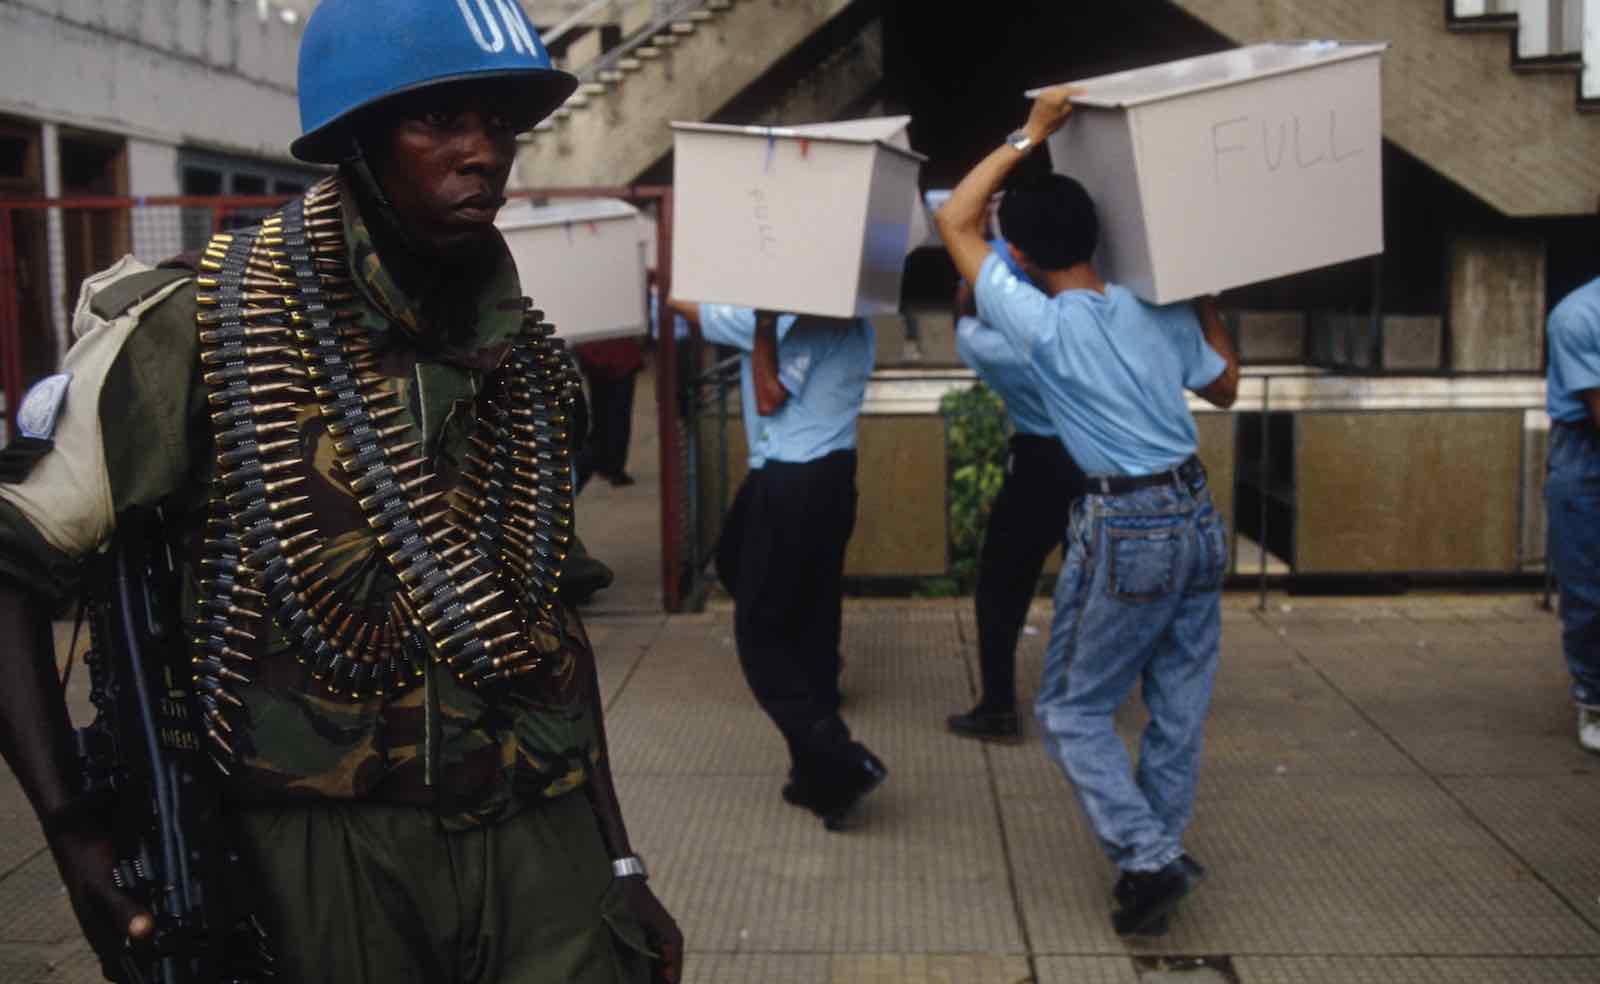 Ballot boxes are collected in Cambodia under UN supervision in 1993 (Photo: Noboru Hashimoto via Getty)